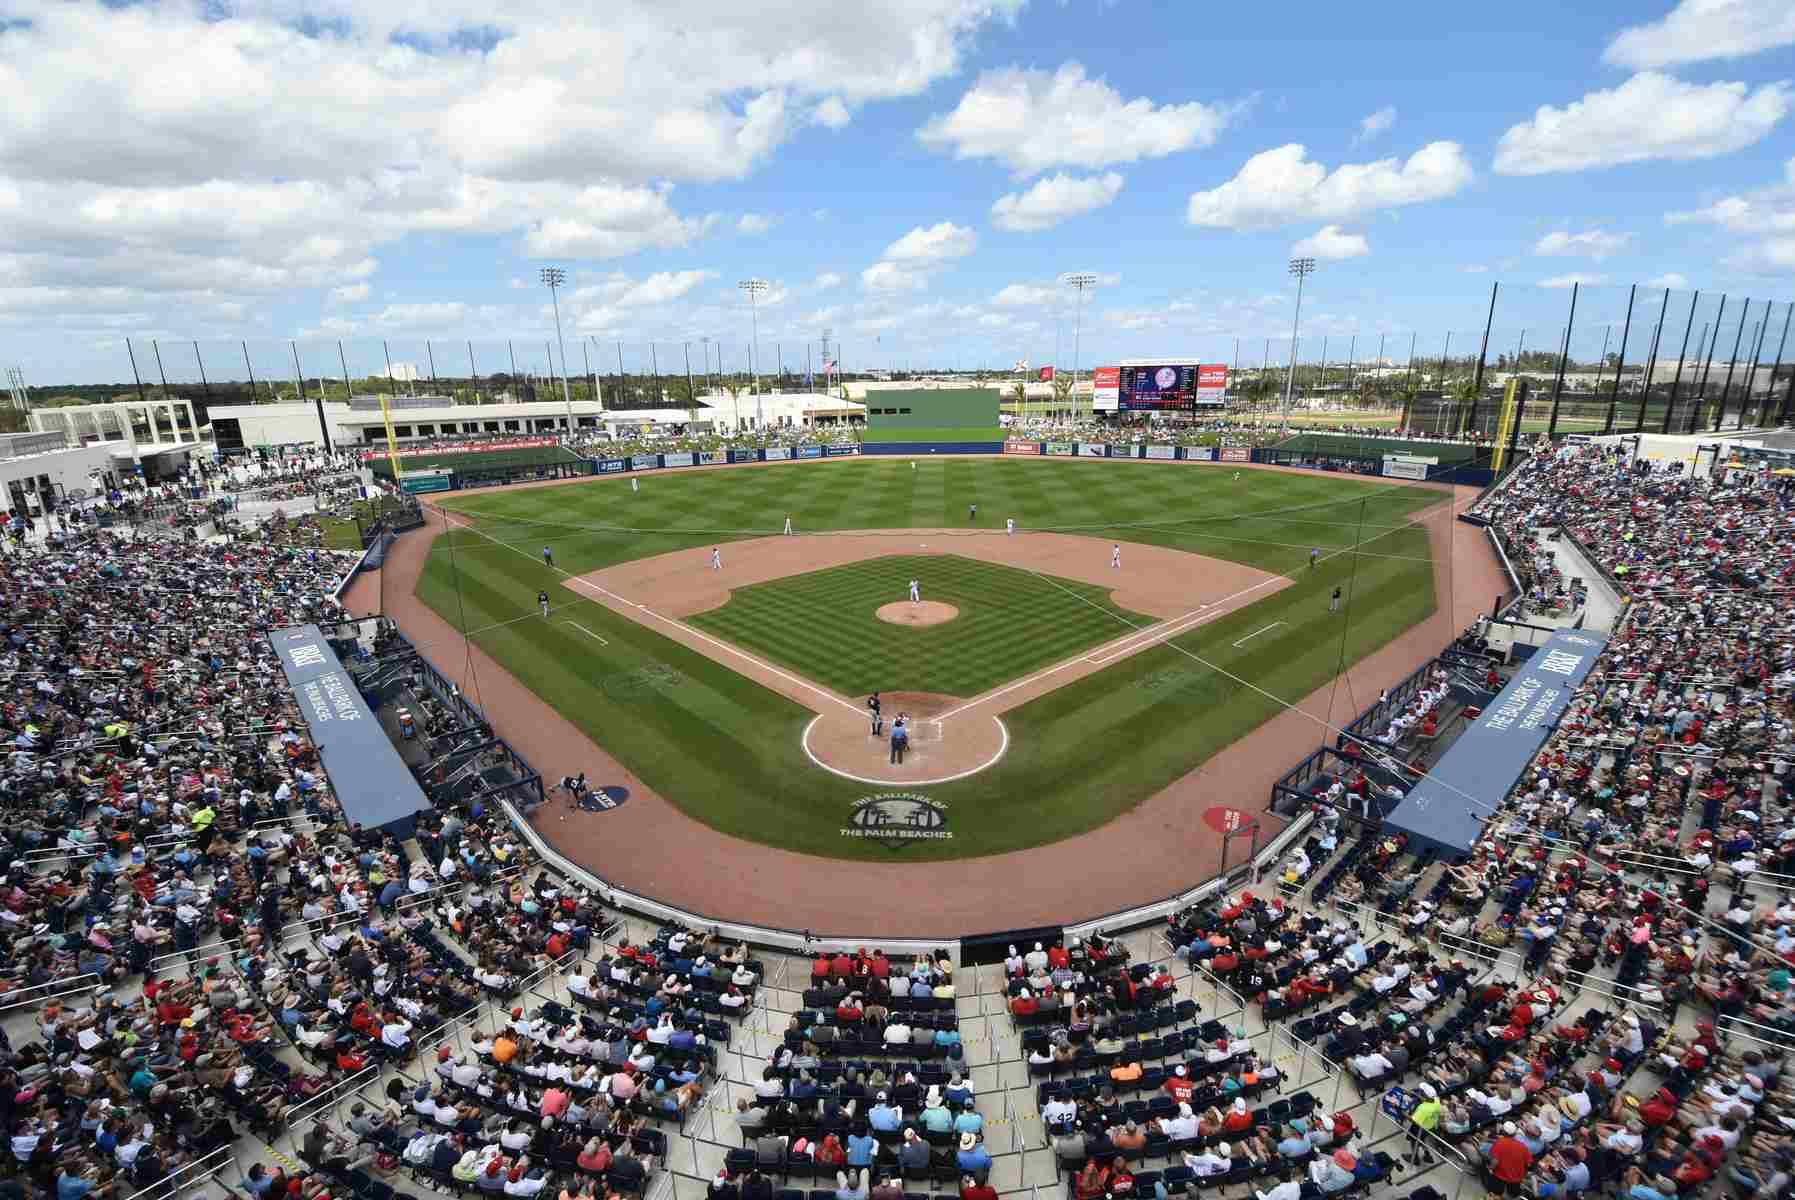 The FITTEAM Ballpark West Palm Beach, Florida